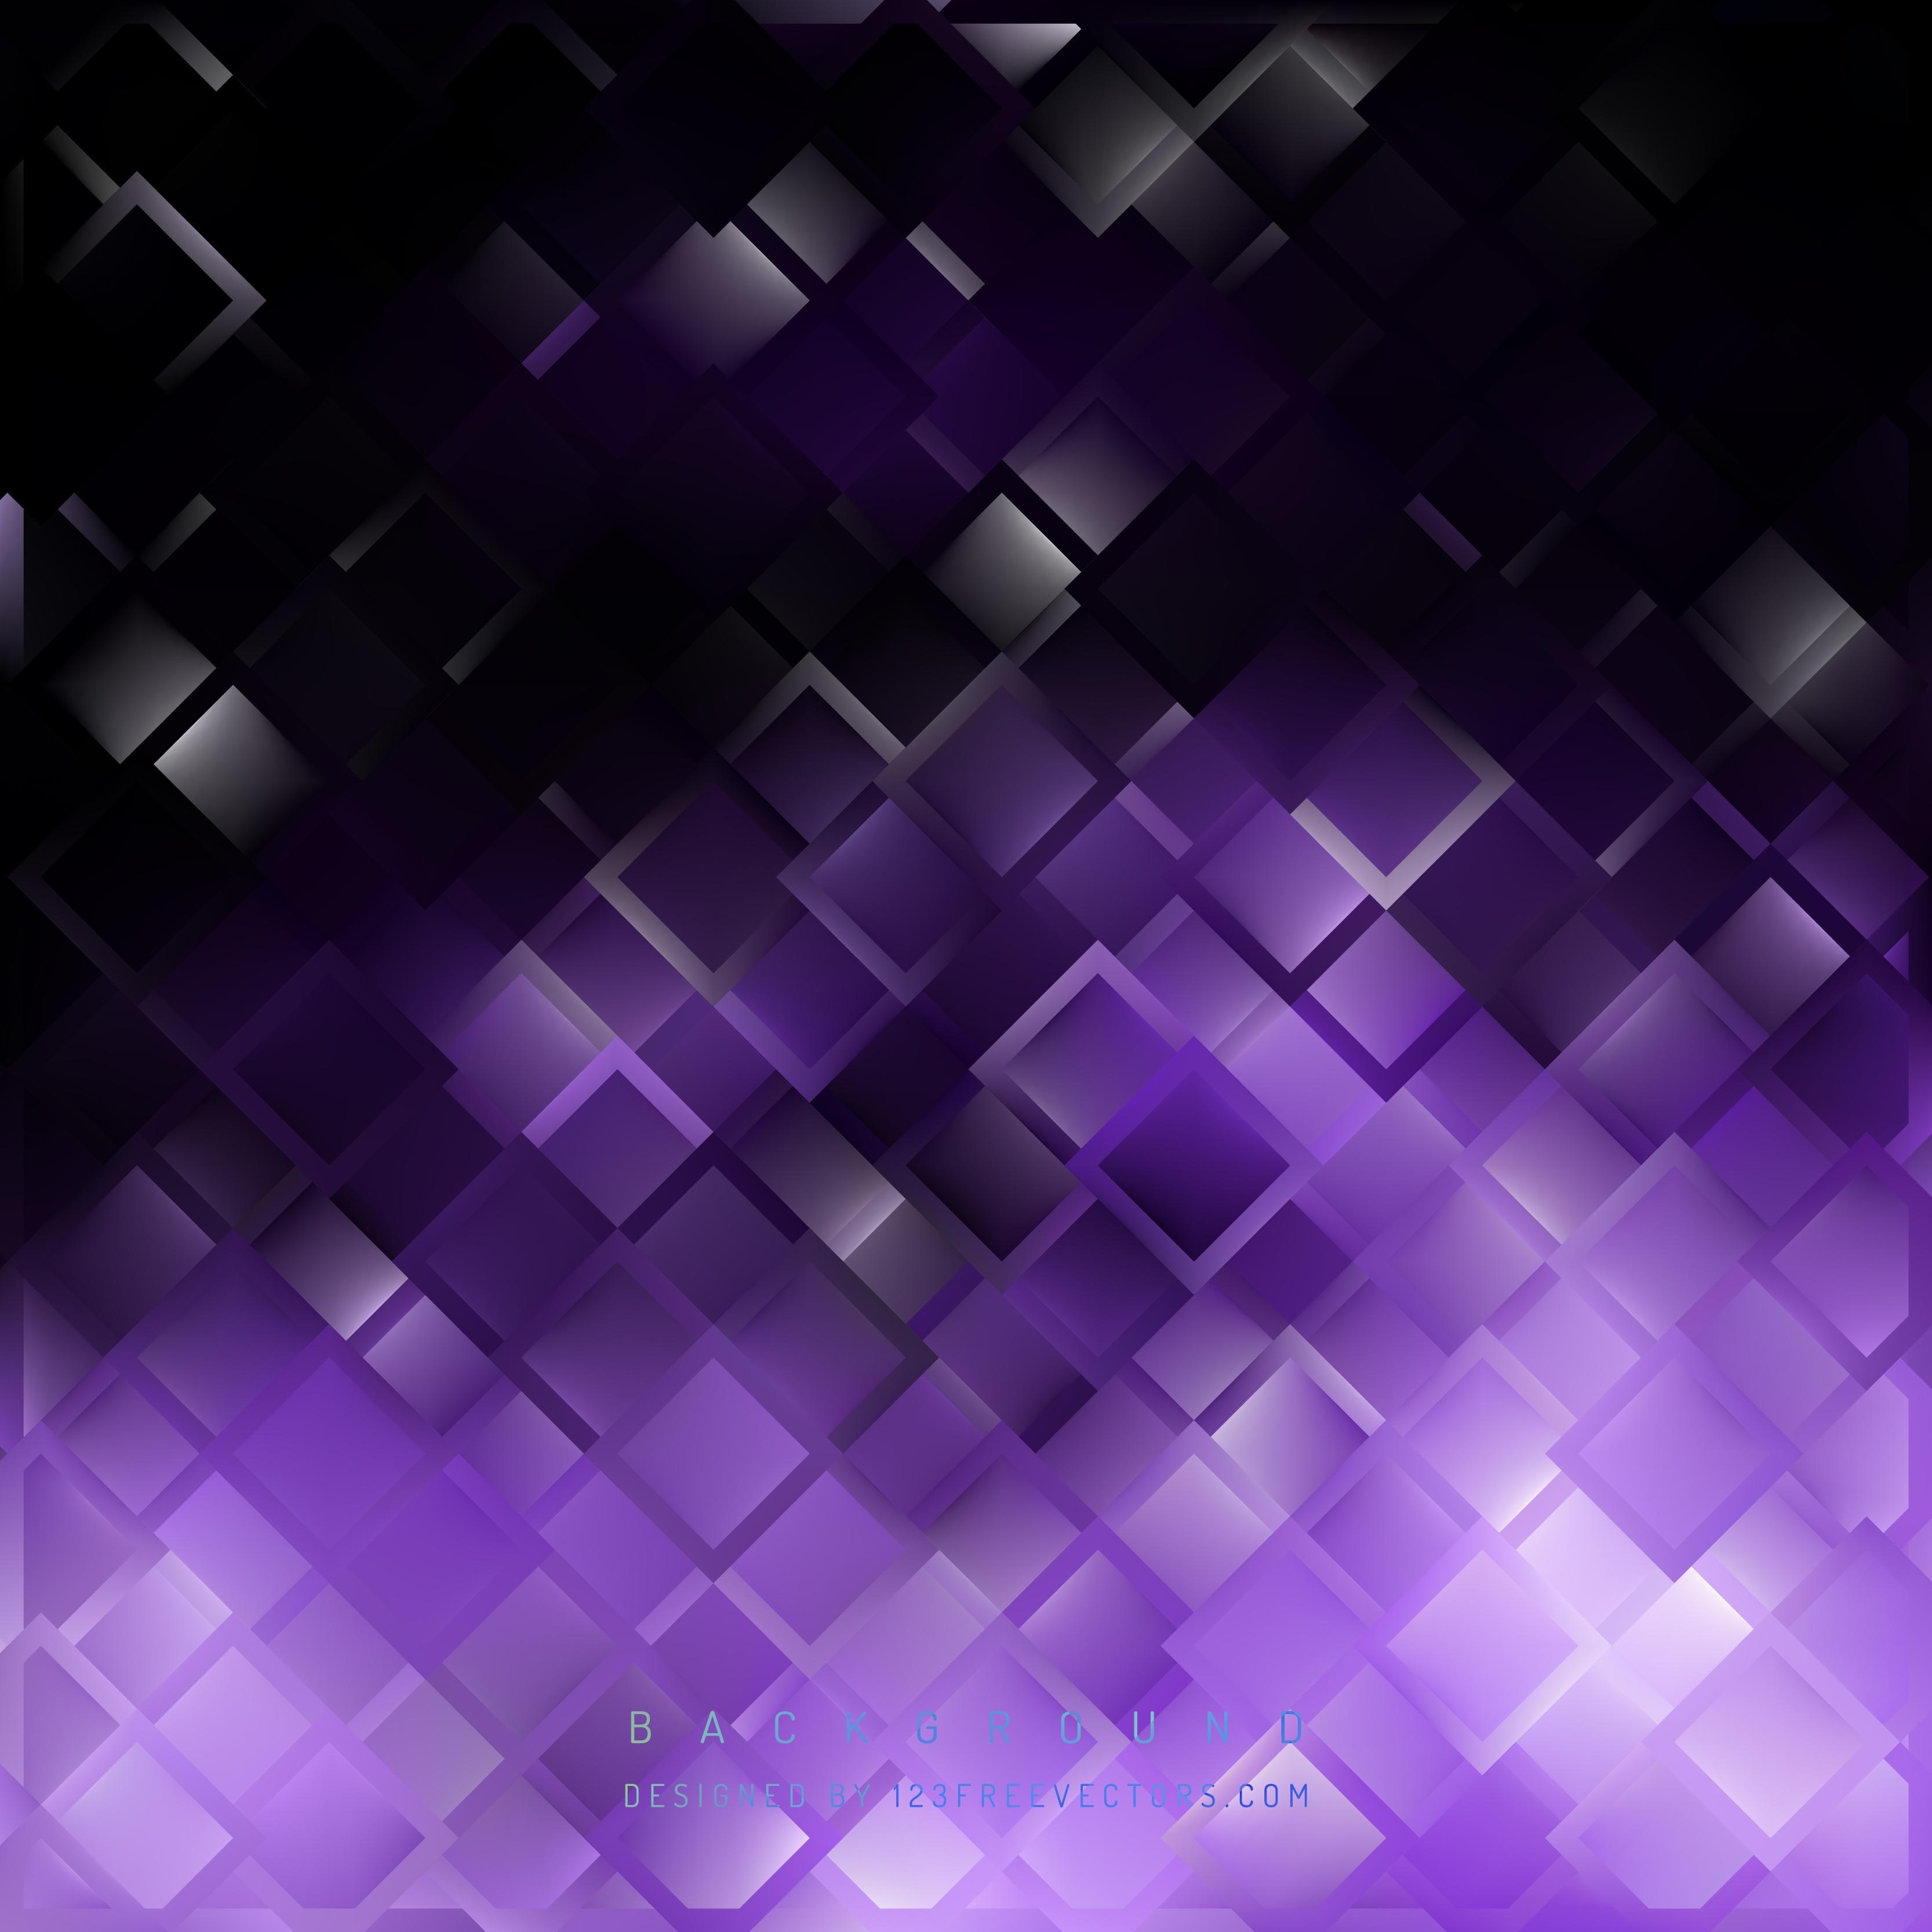 purple black square background design | 123freevectors